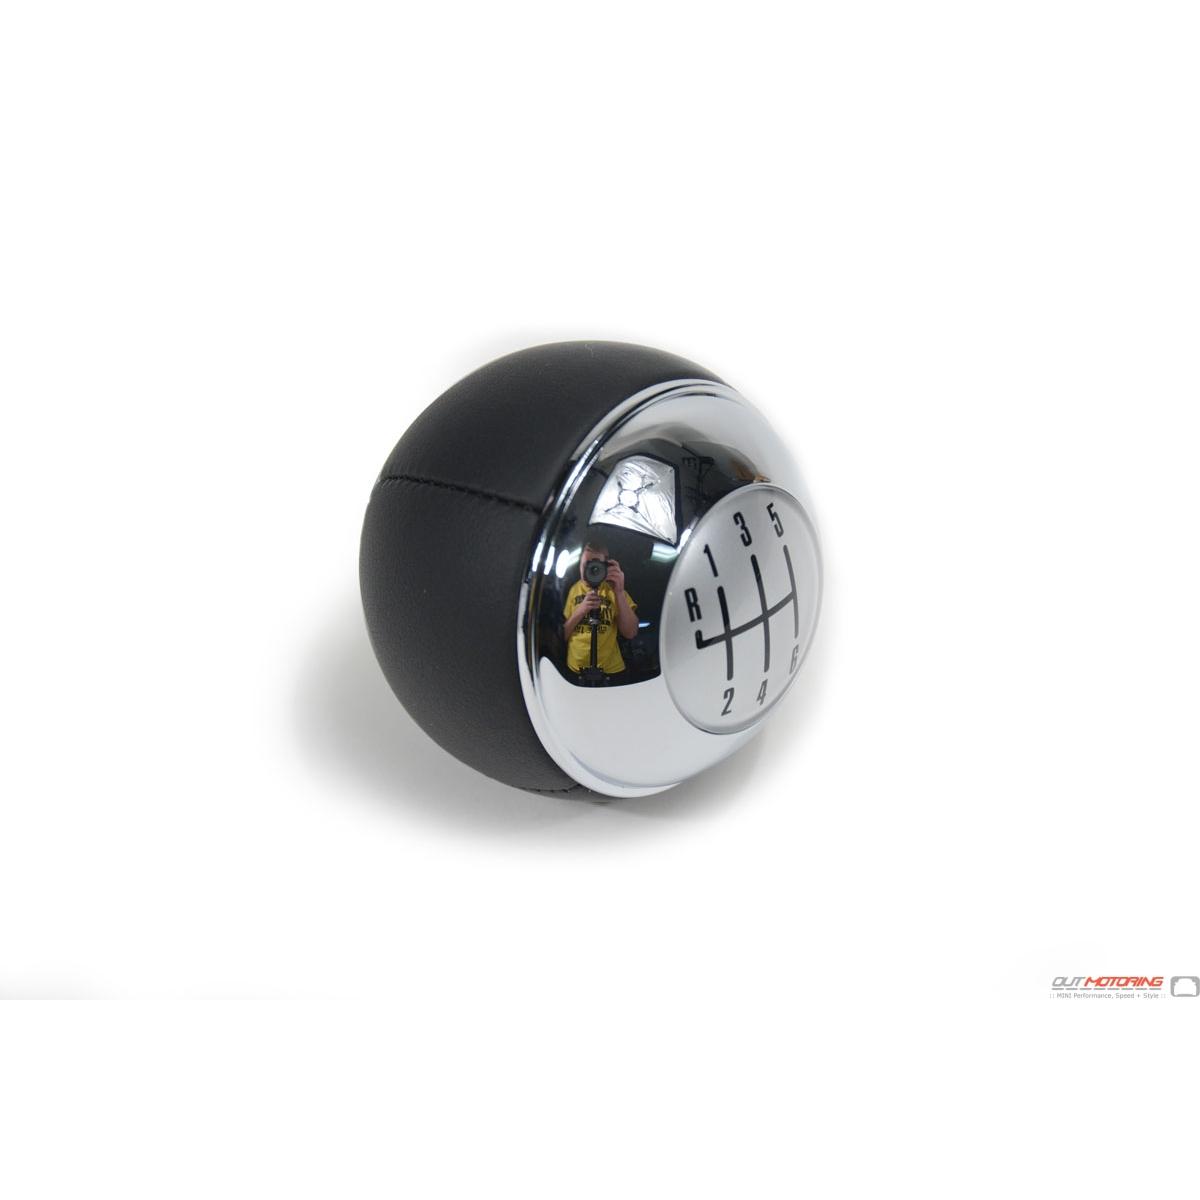 6 speed manual shift knob